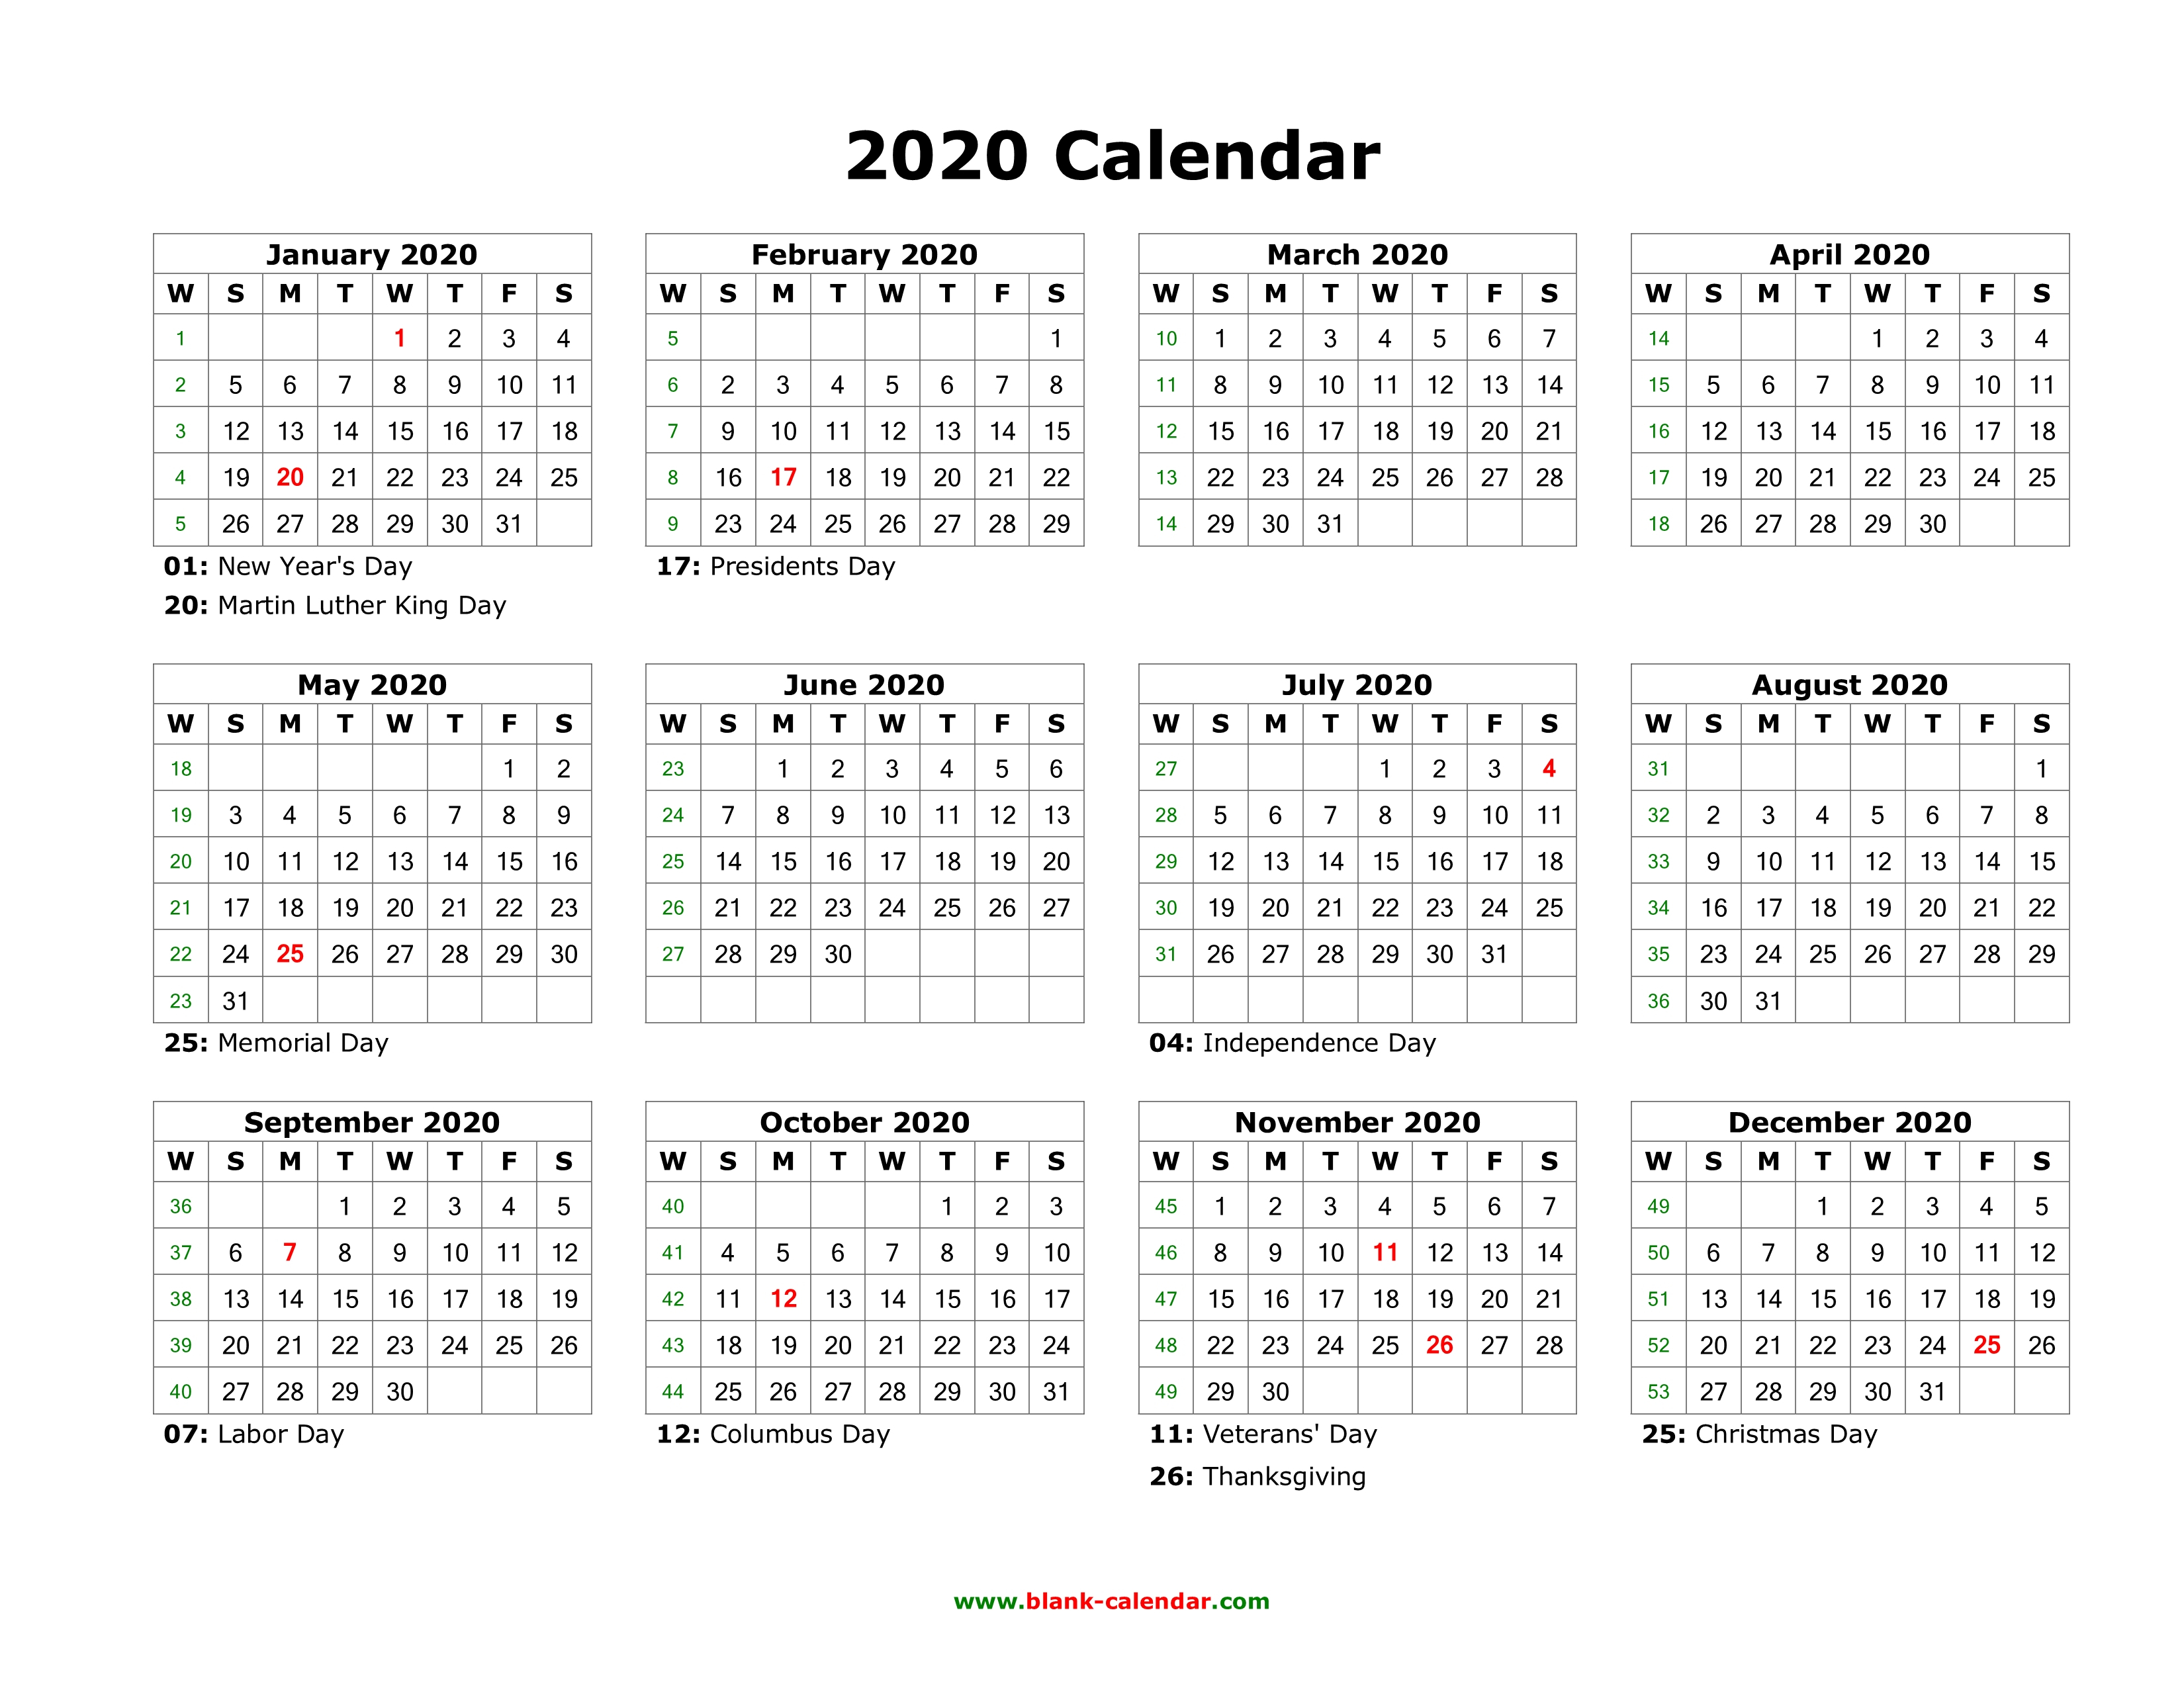 Blank Calendar 2020 | Free Download Calendar Templates intended for 2020 Calendar Printable Free Pdf